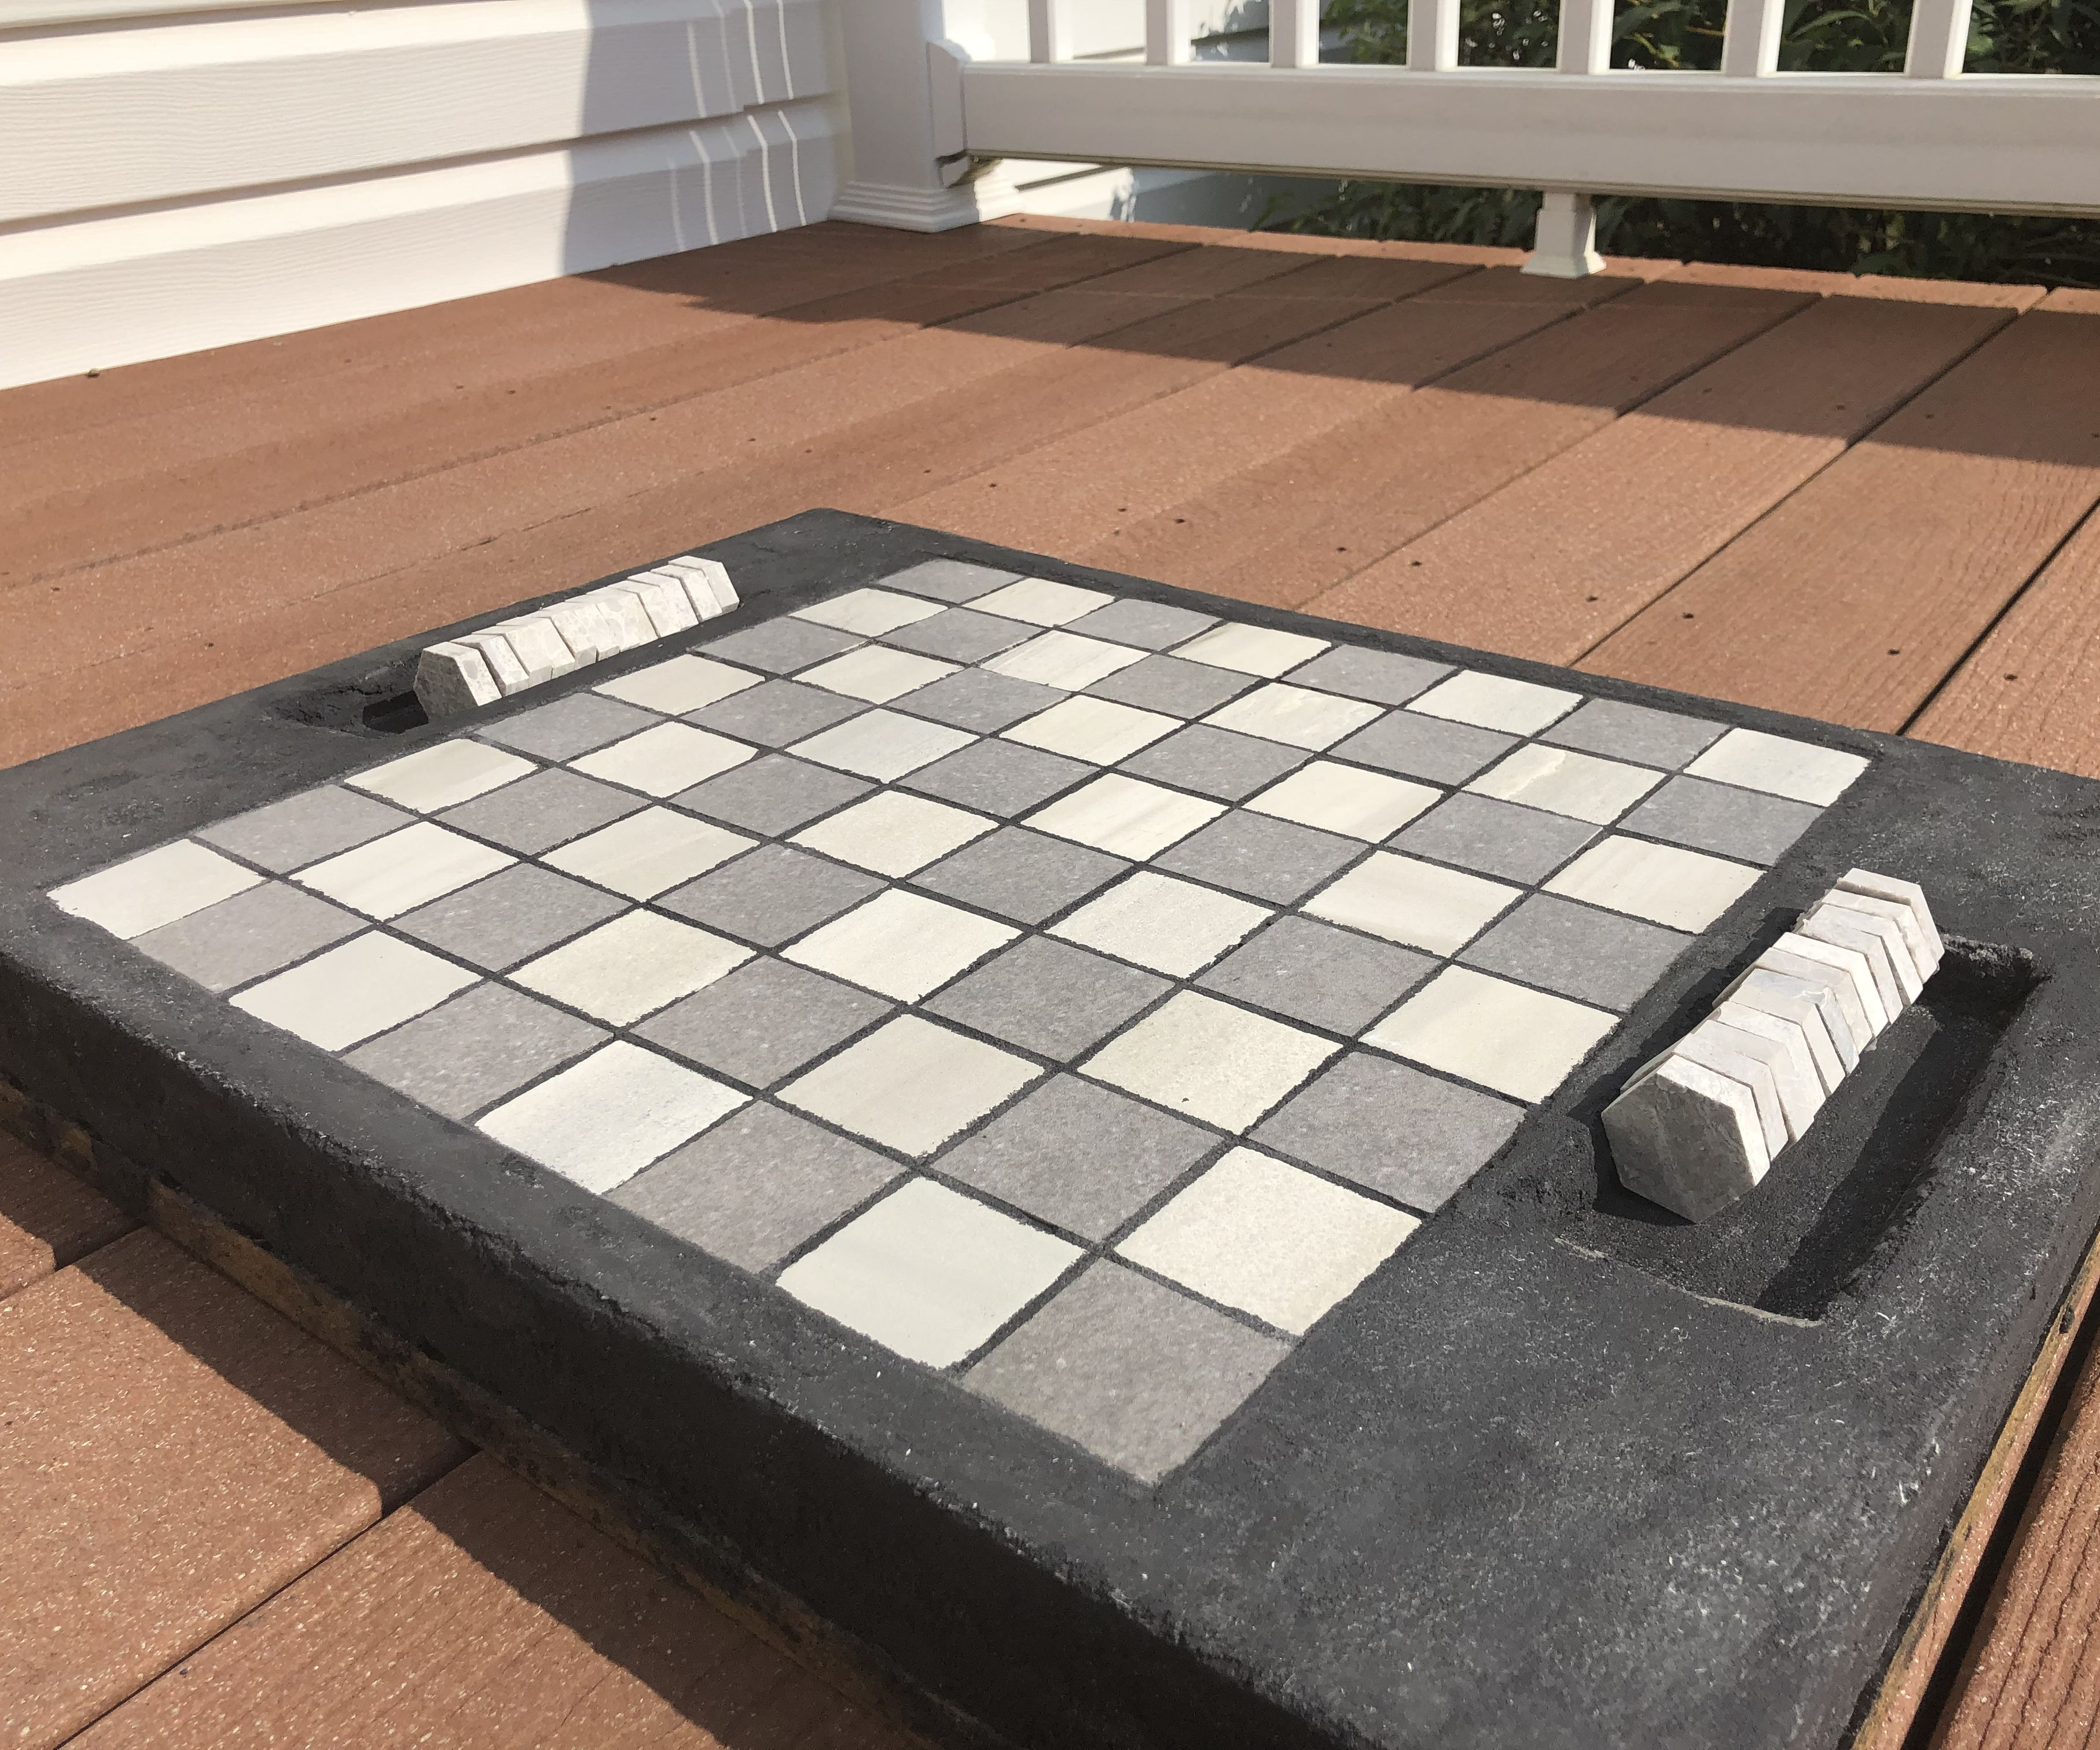 Concrete Checkerboard With Pieces